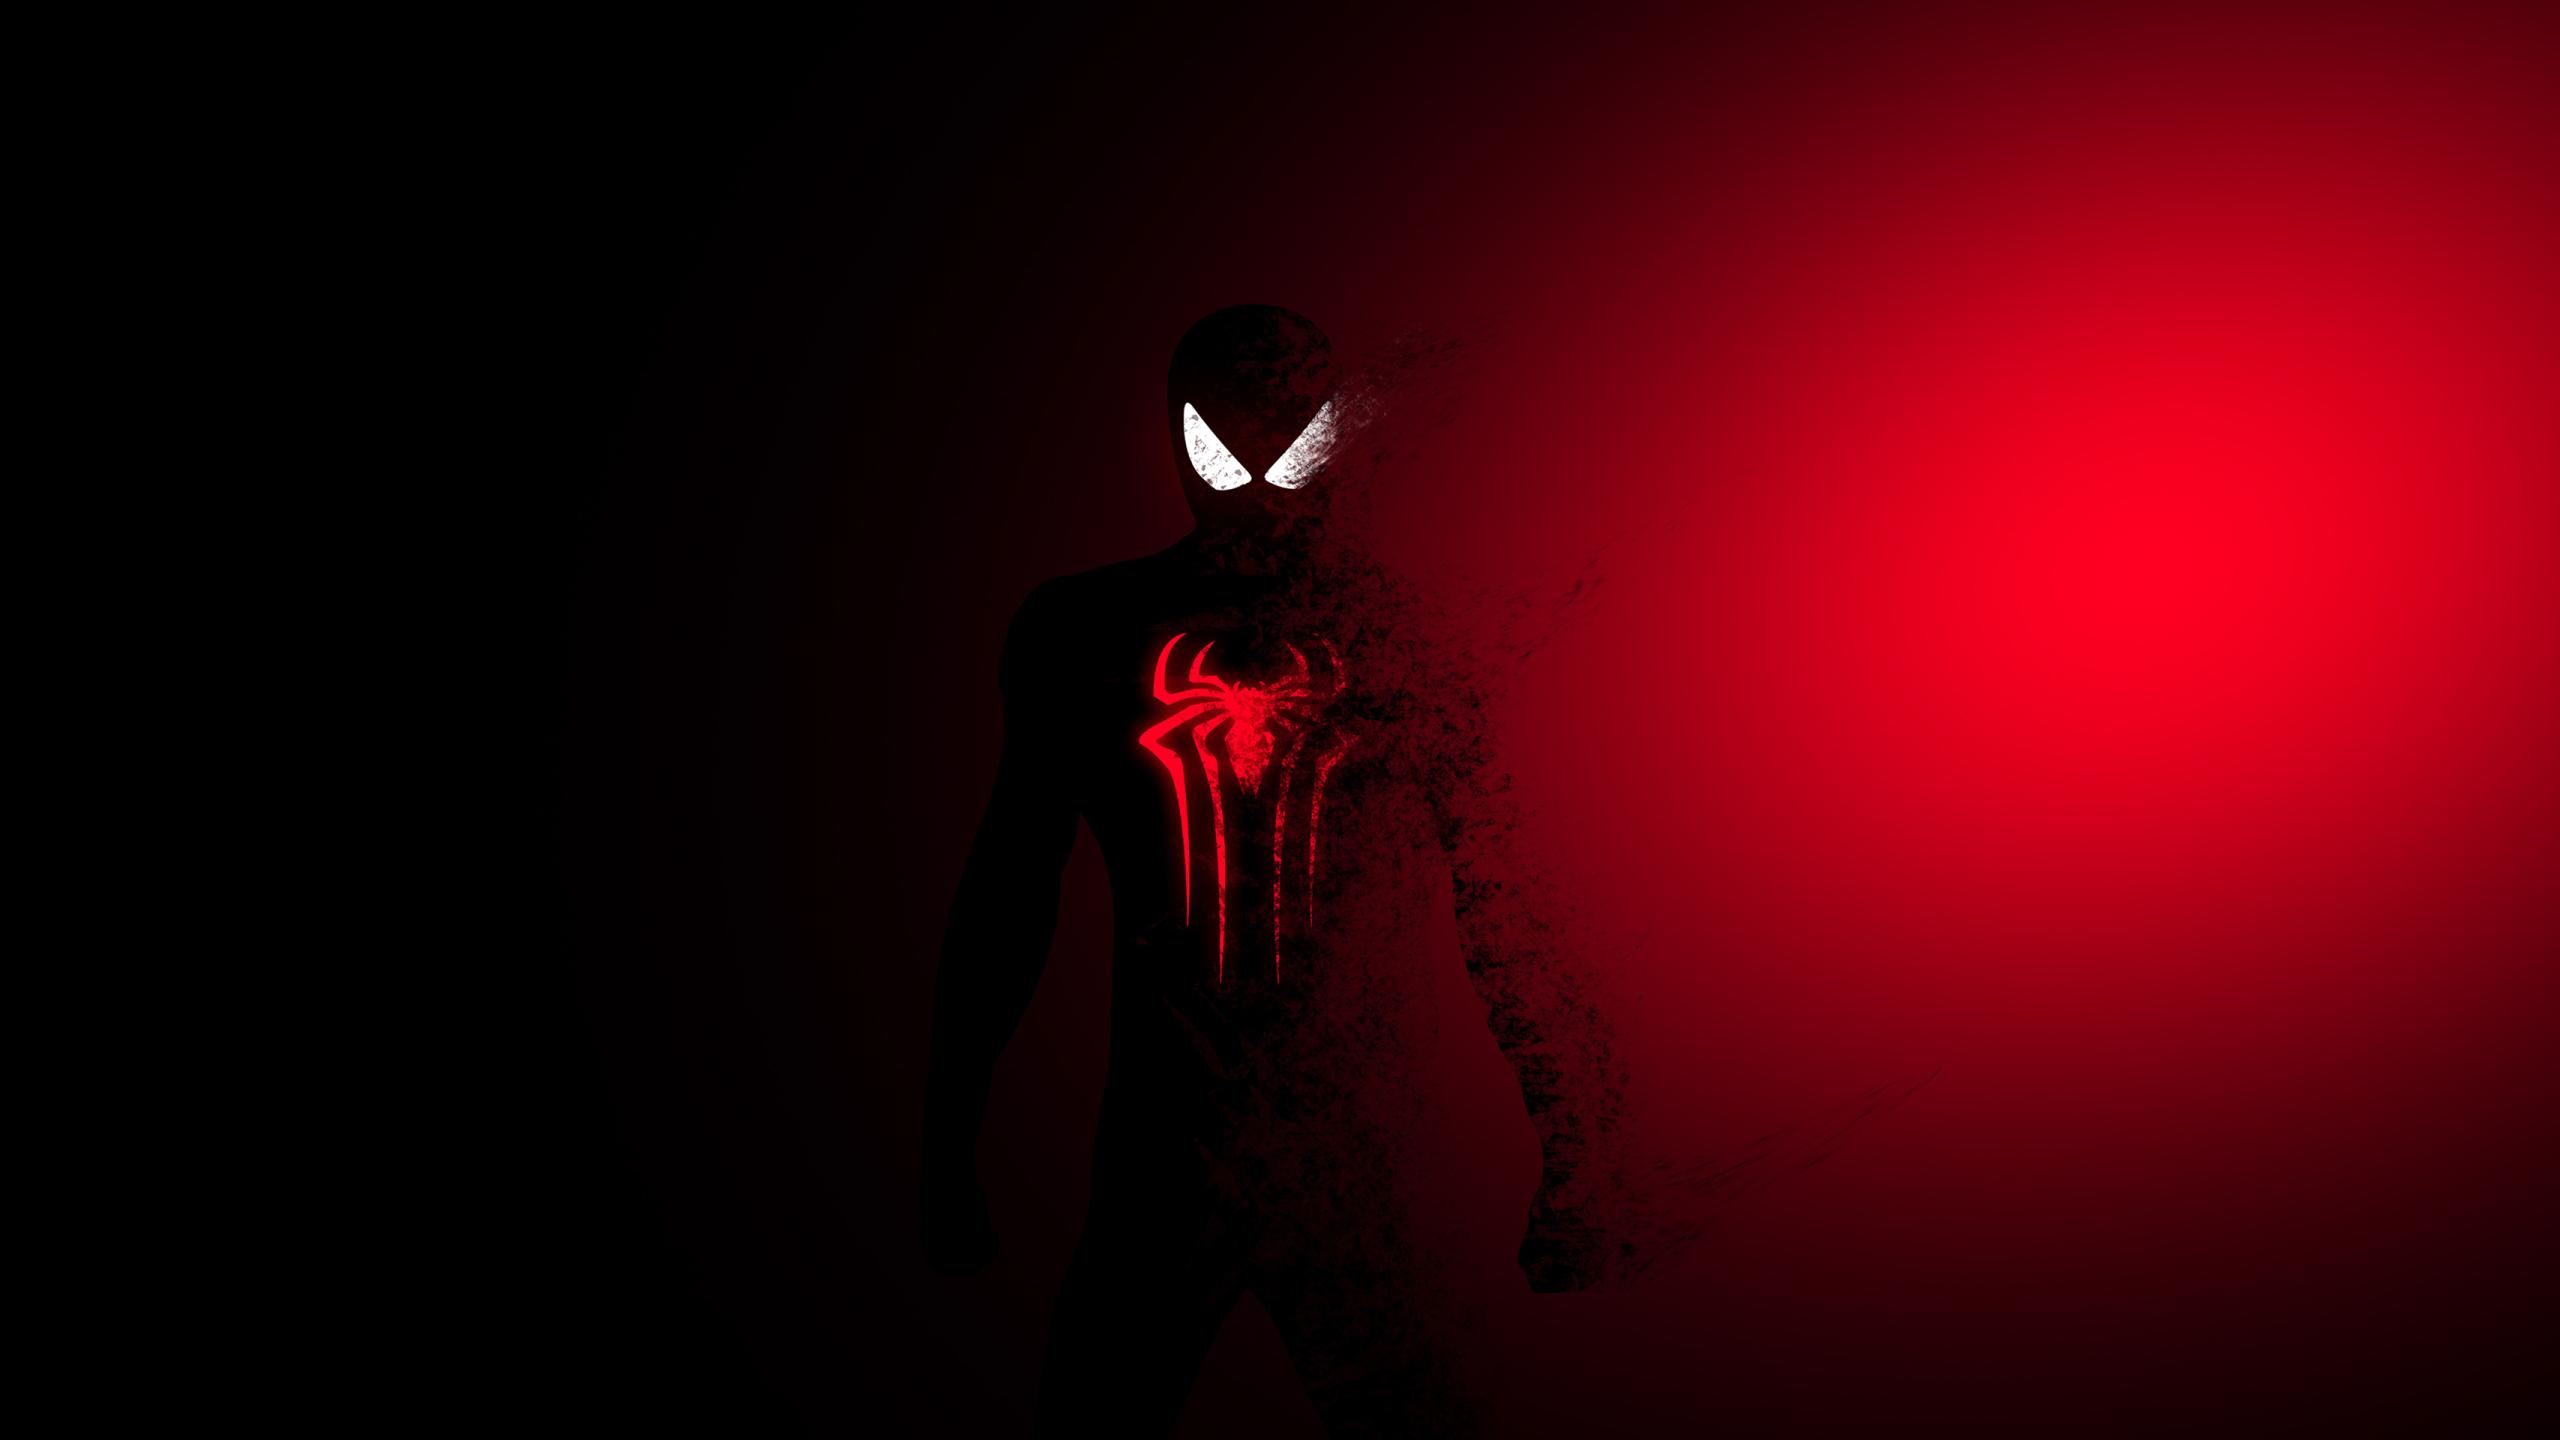 2560x1440 Spider Man Amazing Art 1440p Resolution Wallpaper Hd